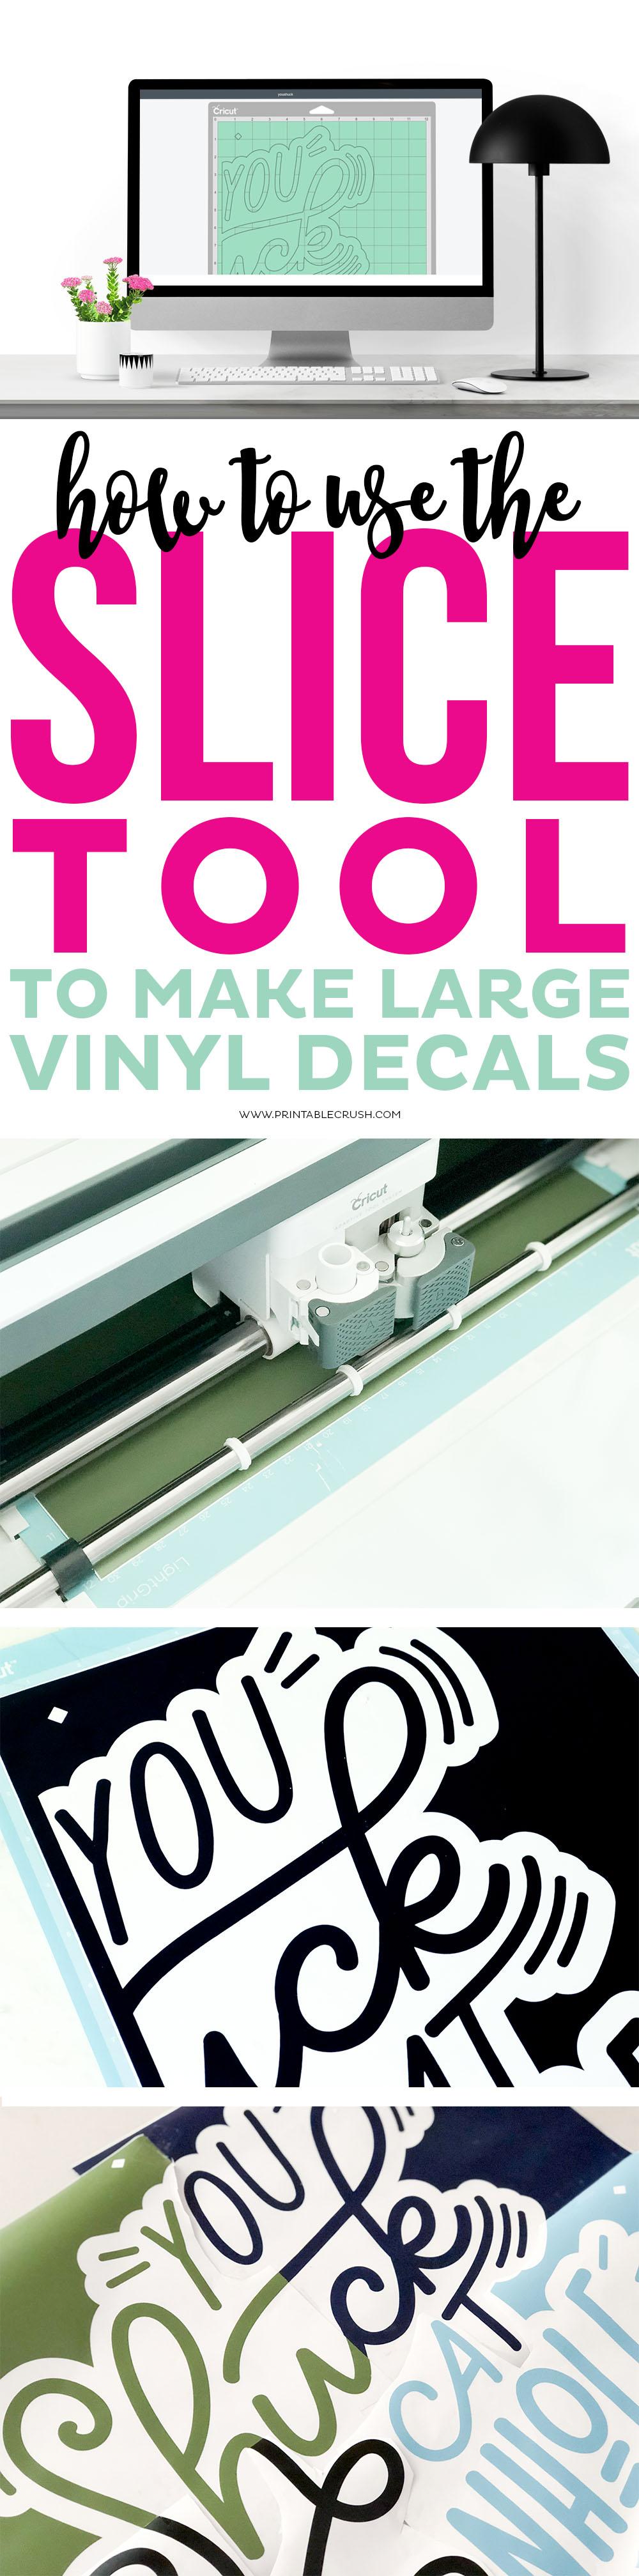 Vinyl decals long collage